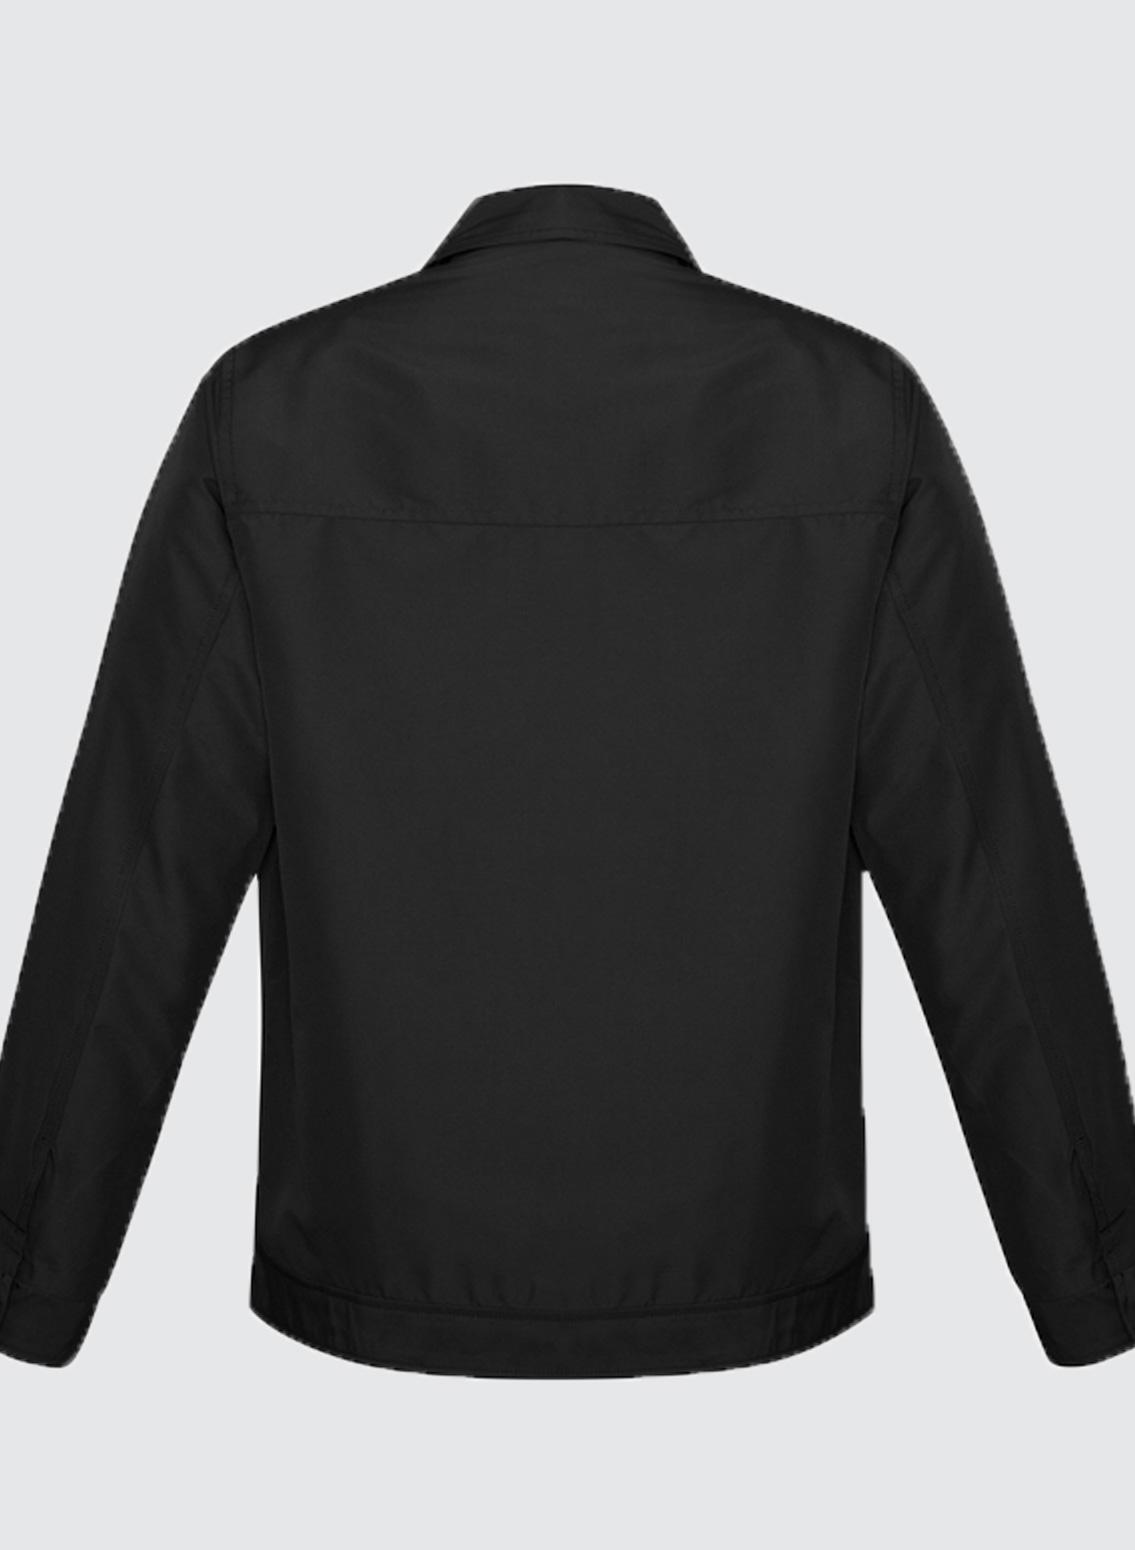 J125ml Mens Studio Jacket Business Image Group